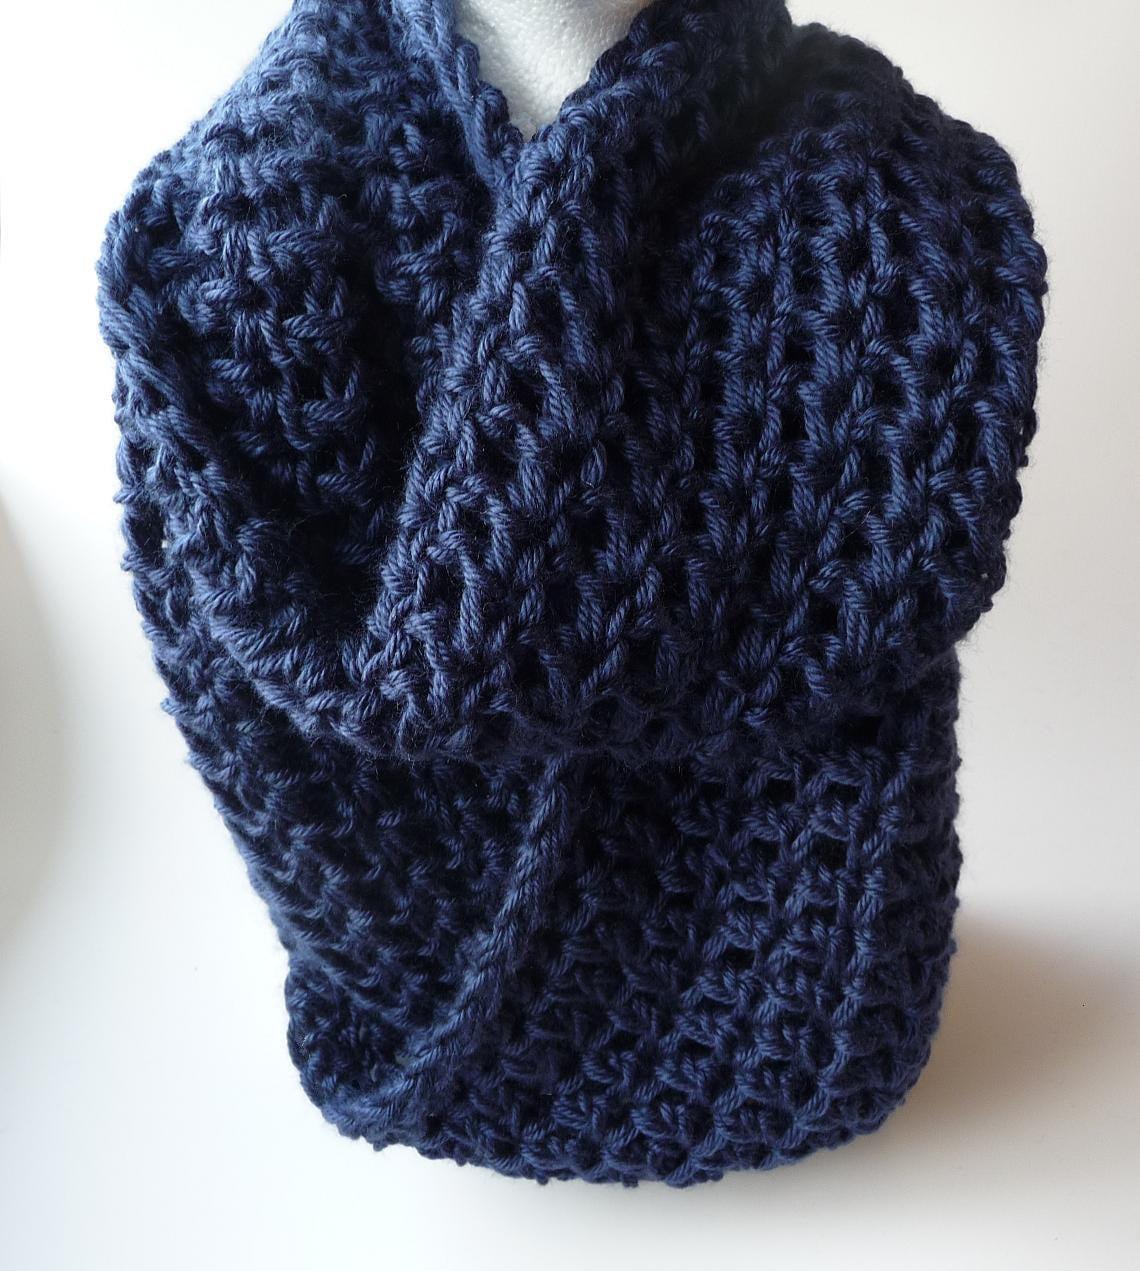 Infinity scarf crochet pattern crochet scarf pattern scarf zoom bankloansurffo Image collections